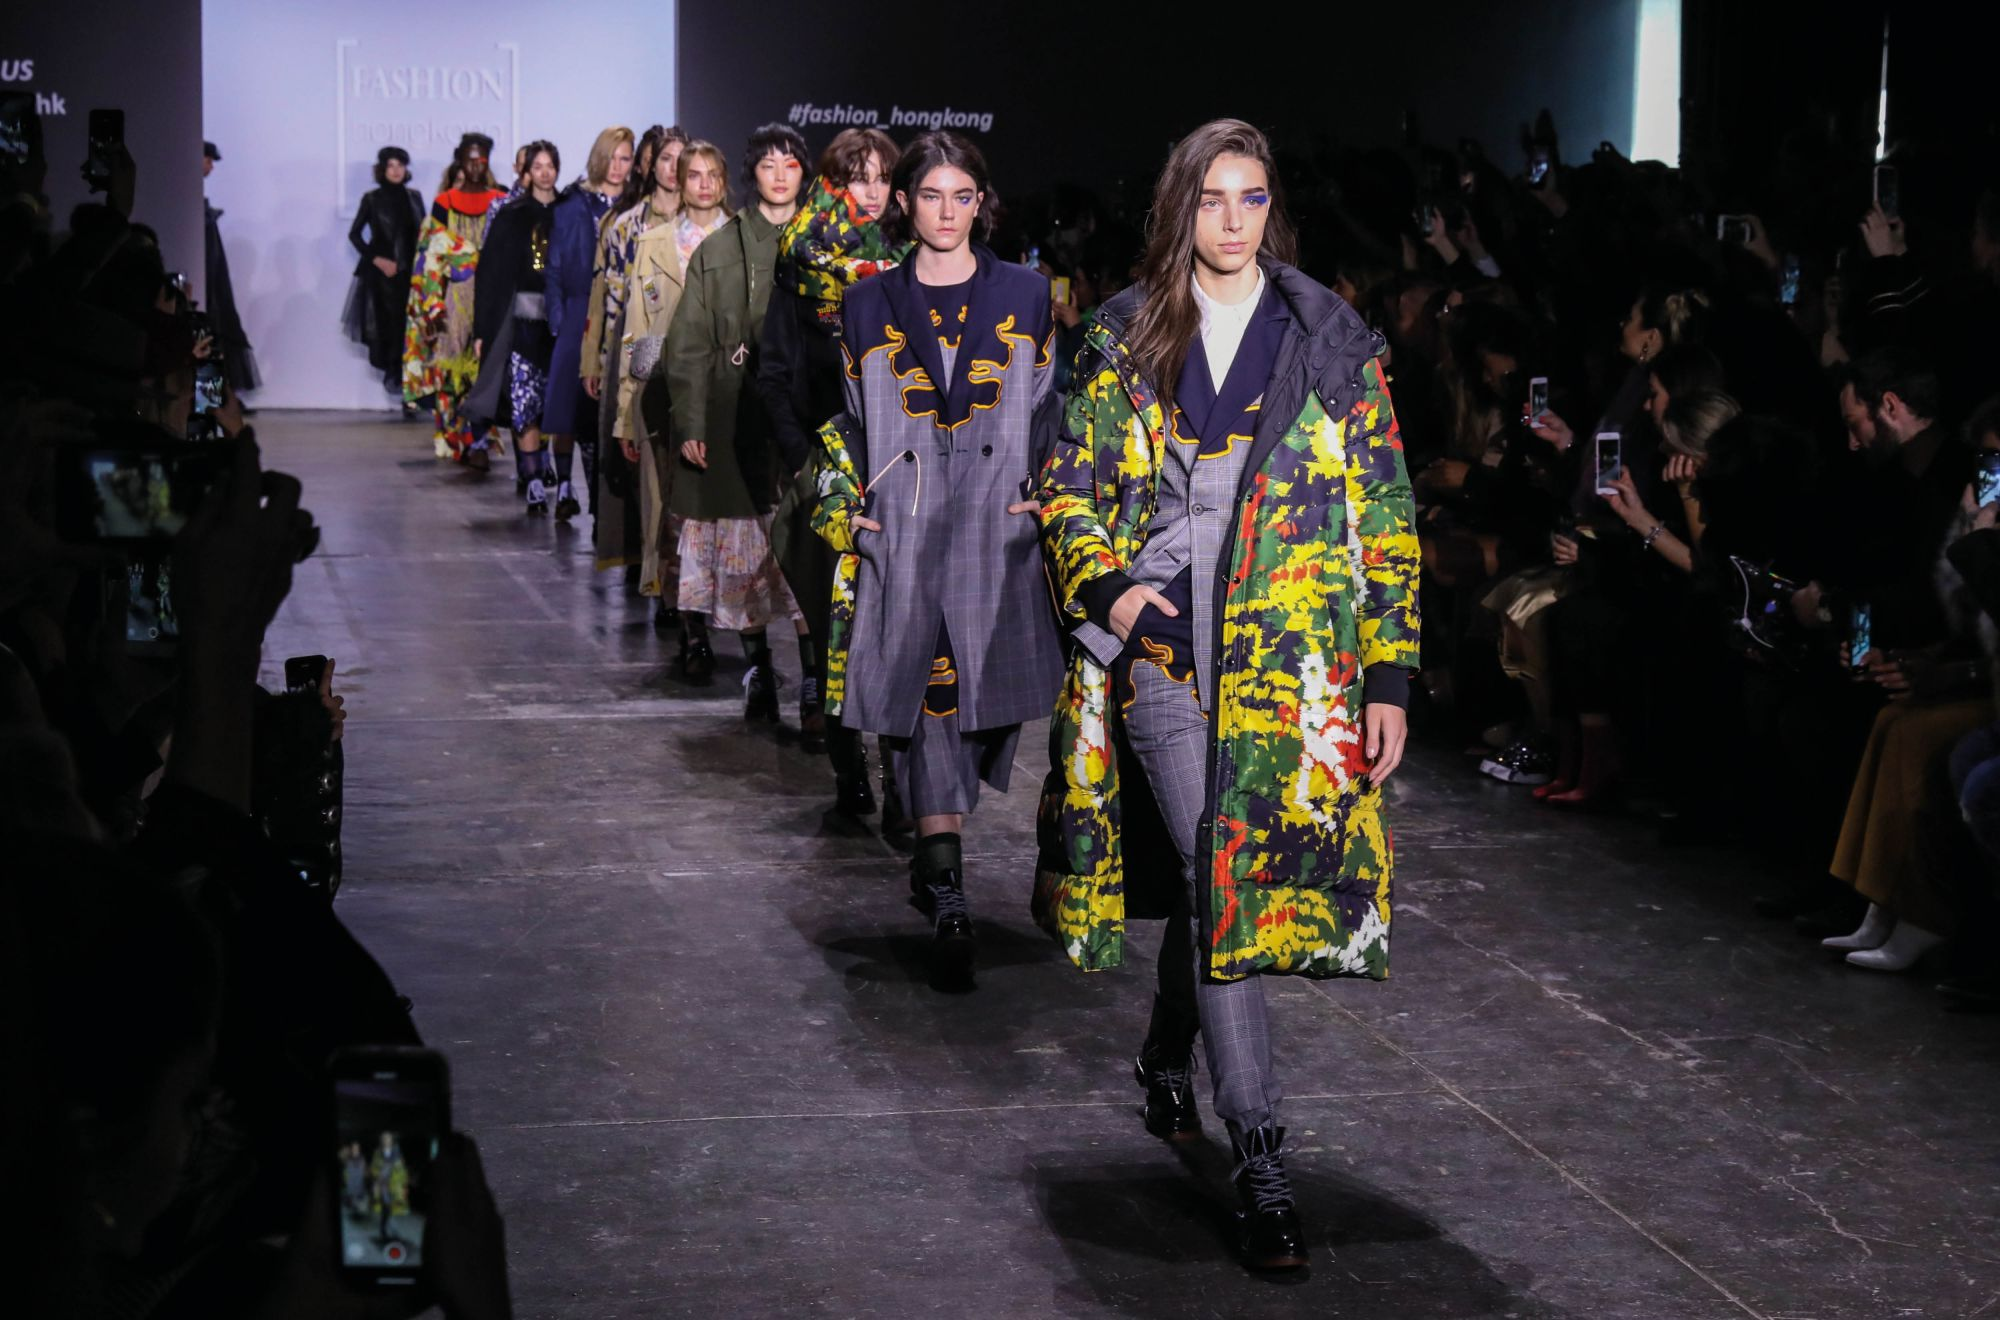 A Closer Look At HKTDC's Fashion Hong Kong Campaign In New York